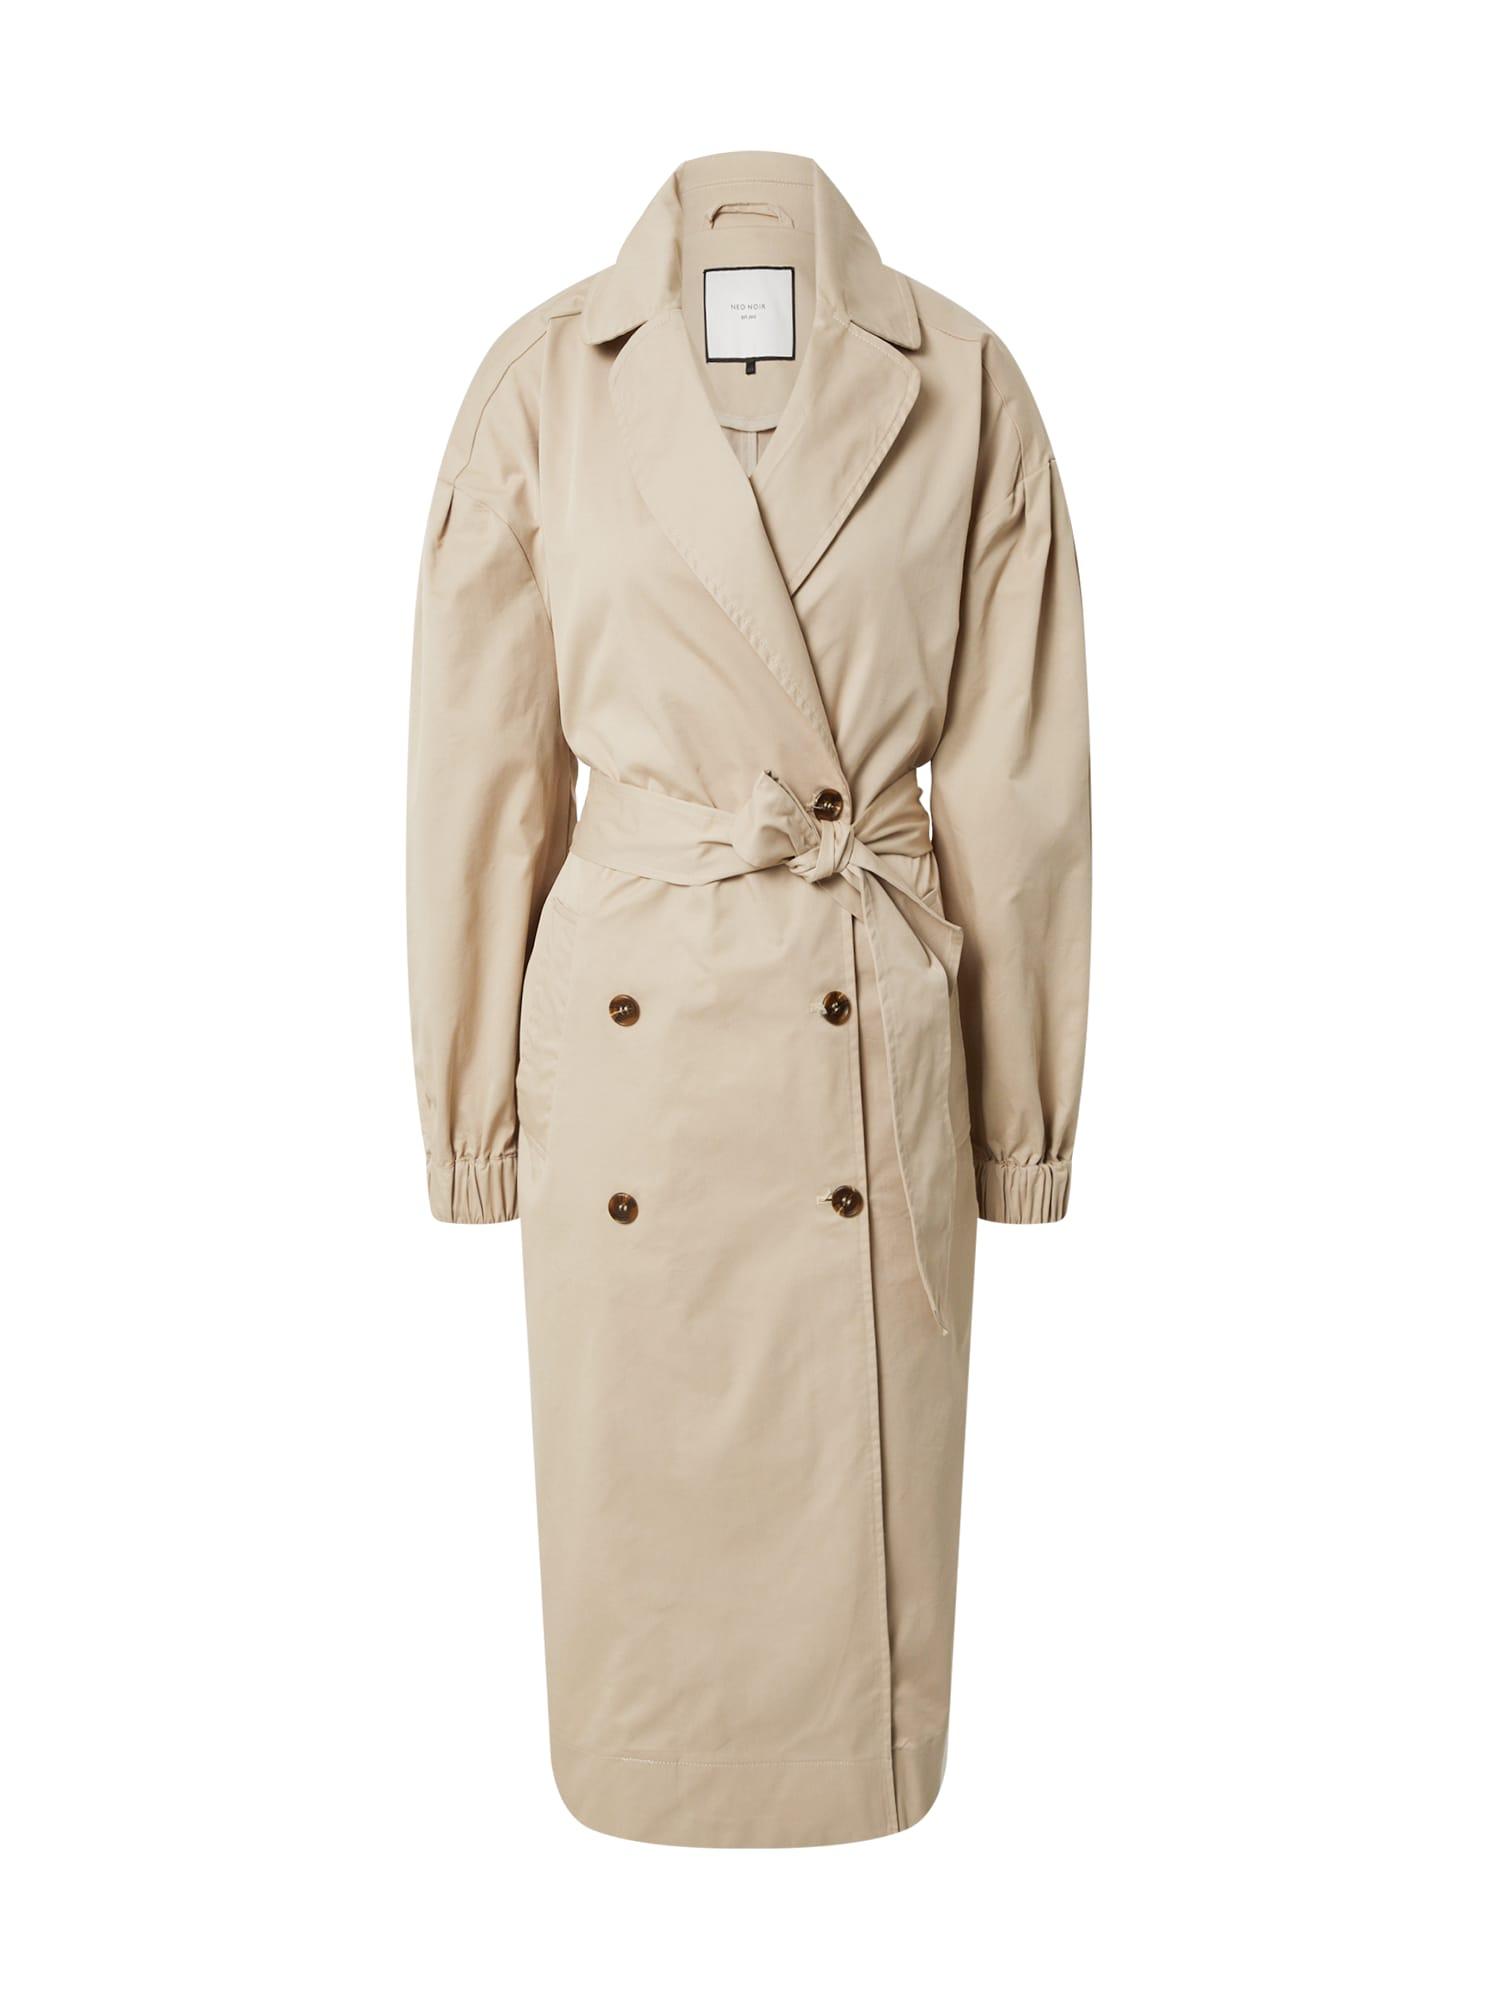 Neo Noir Demisezoninis paltas 'Branco' kūno spalva